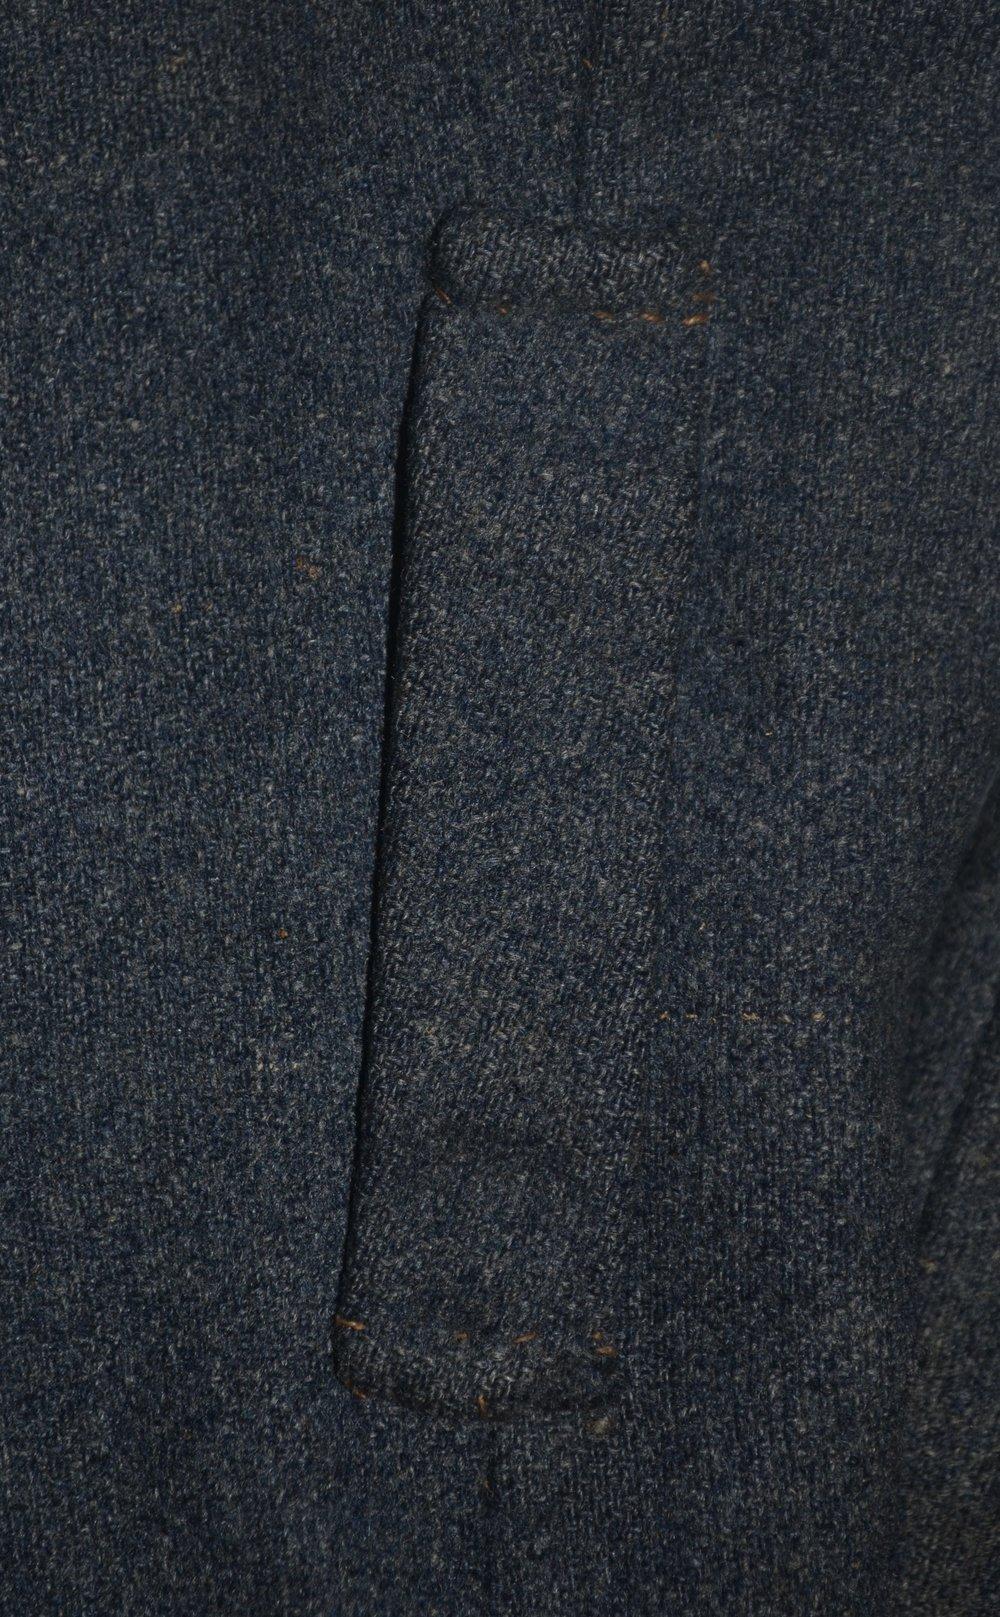 George H T Greer jacket – centered on side seam